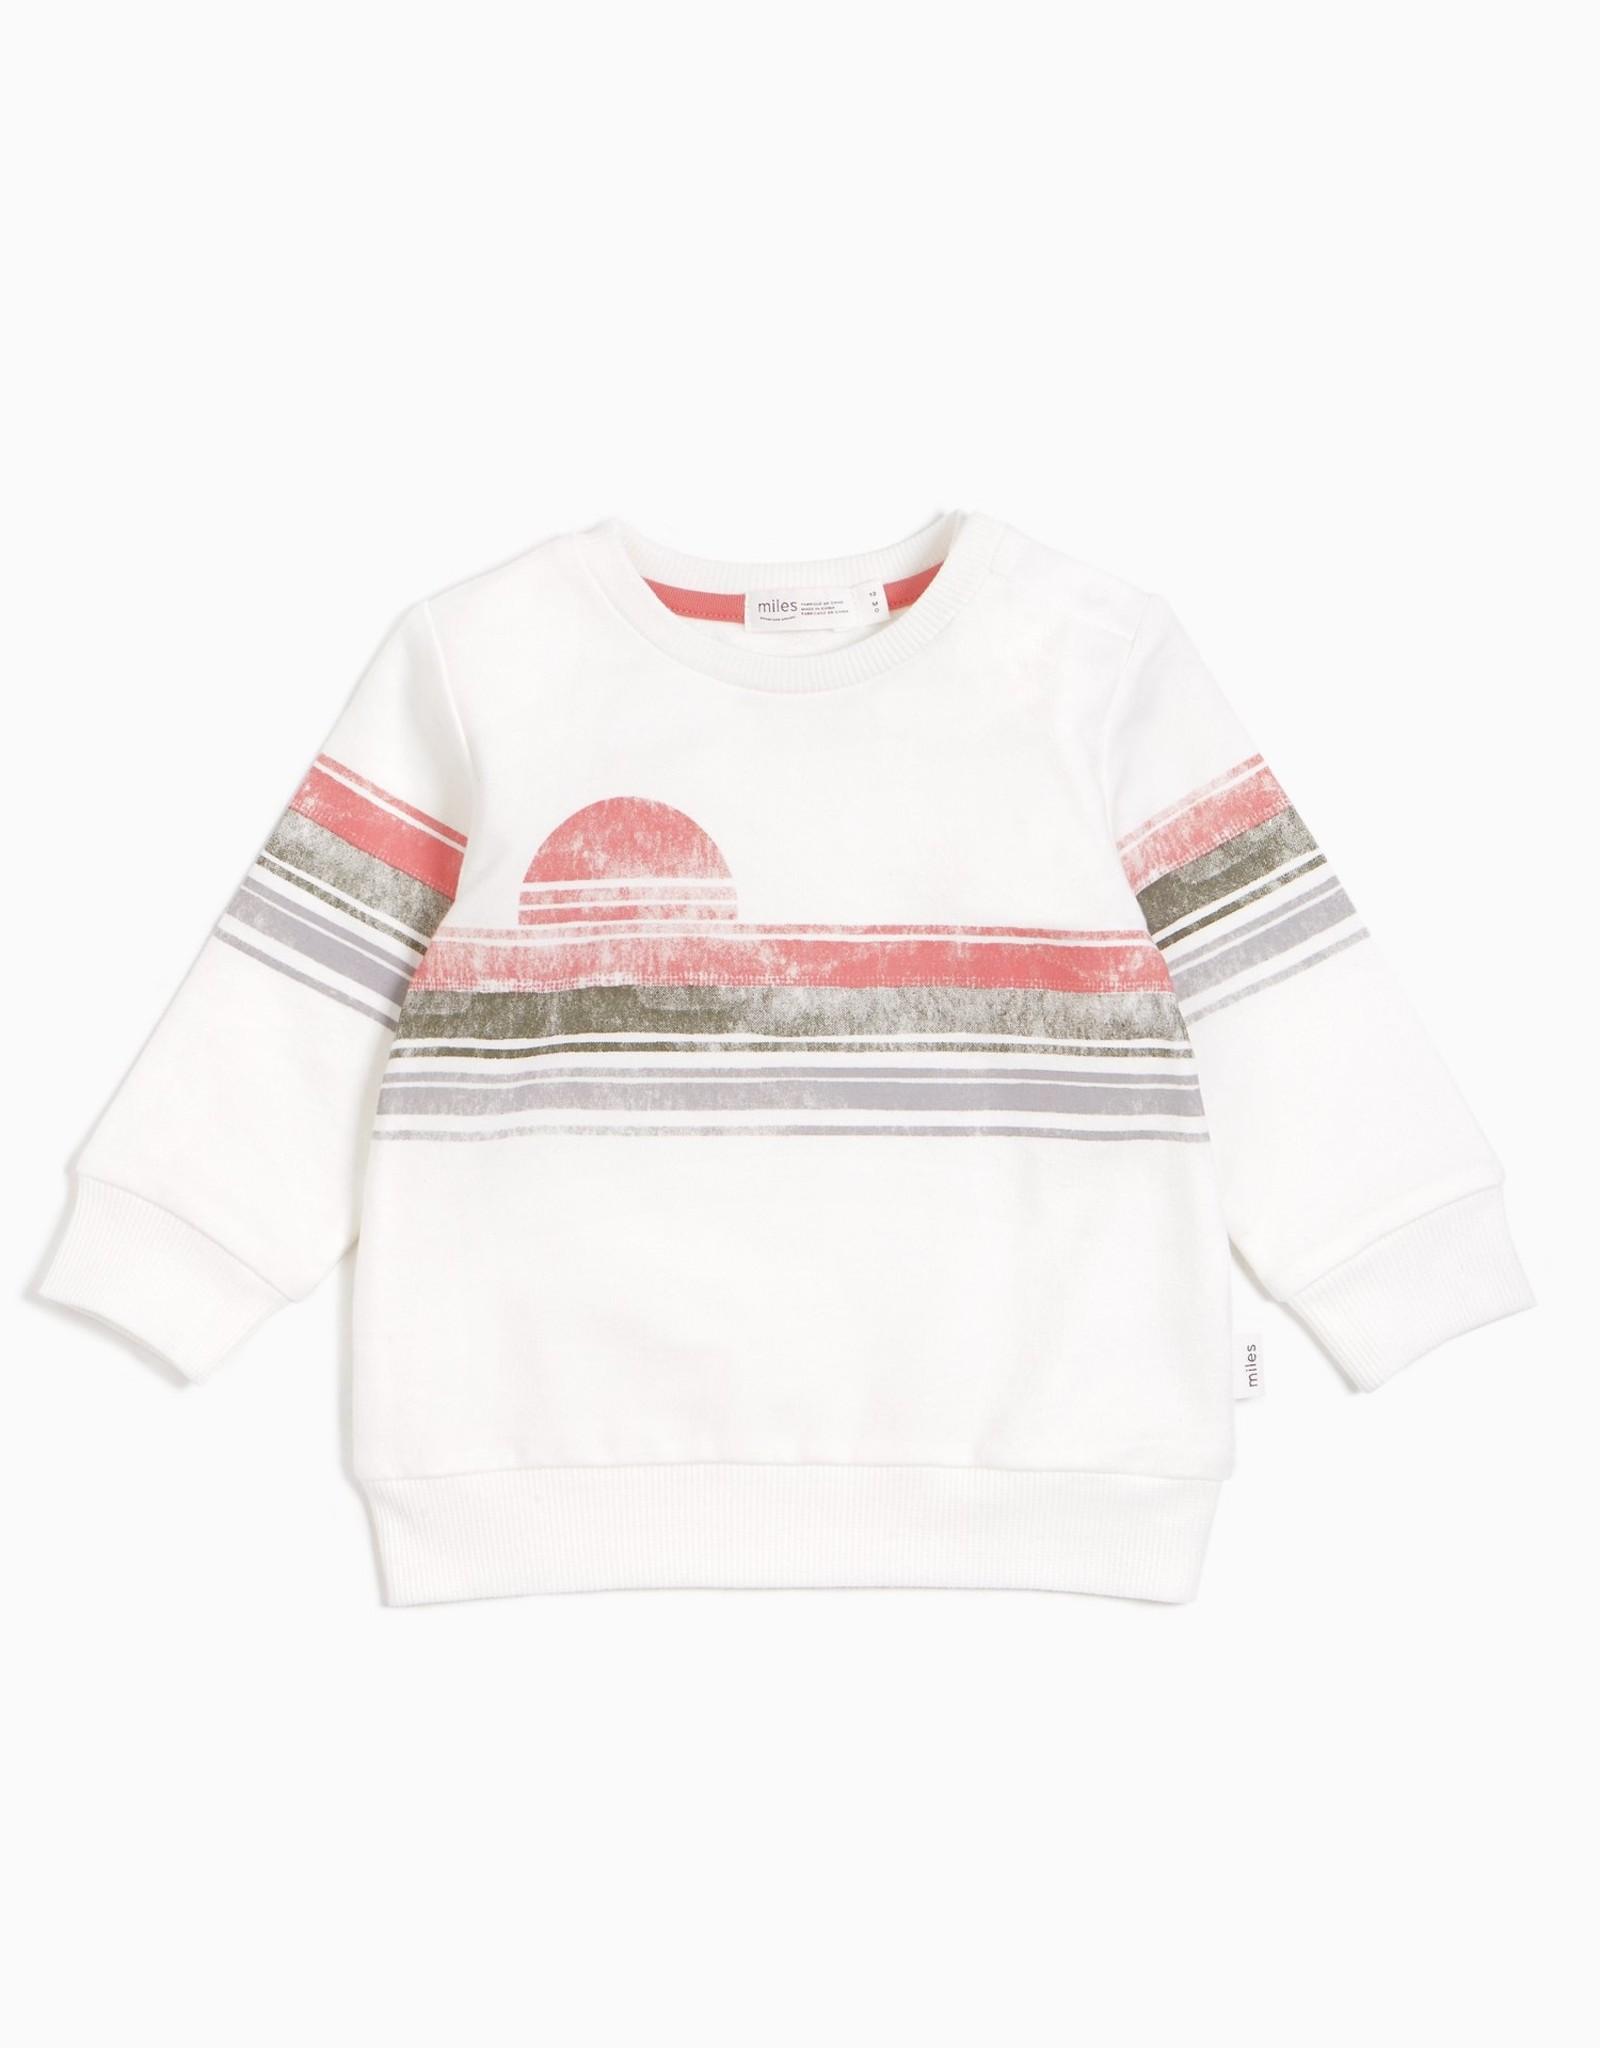 Miles SP21 G Lakeview Sweatshirt